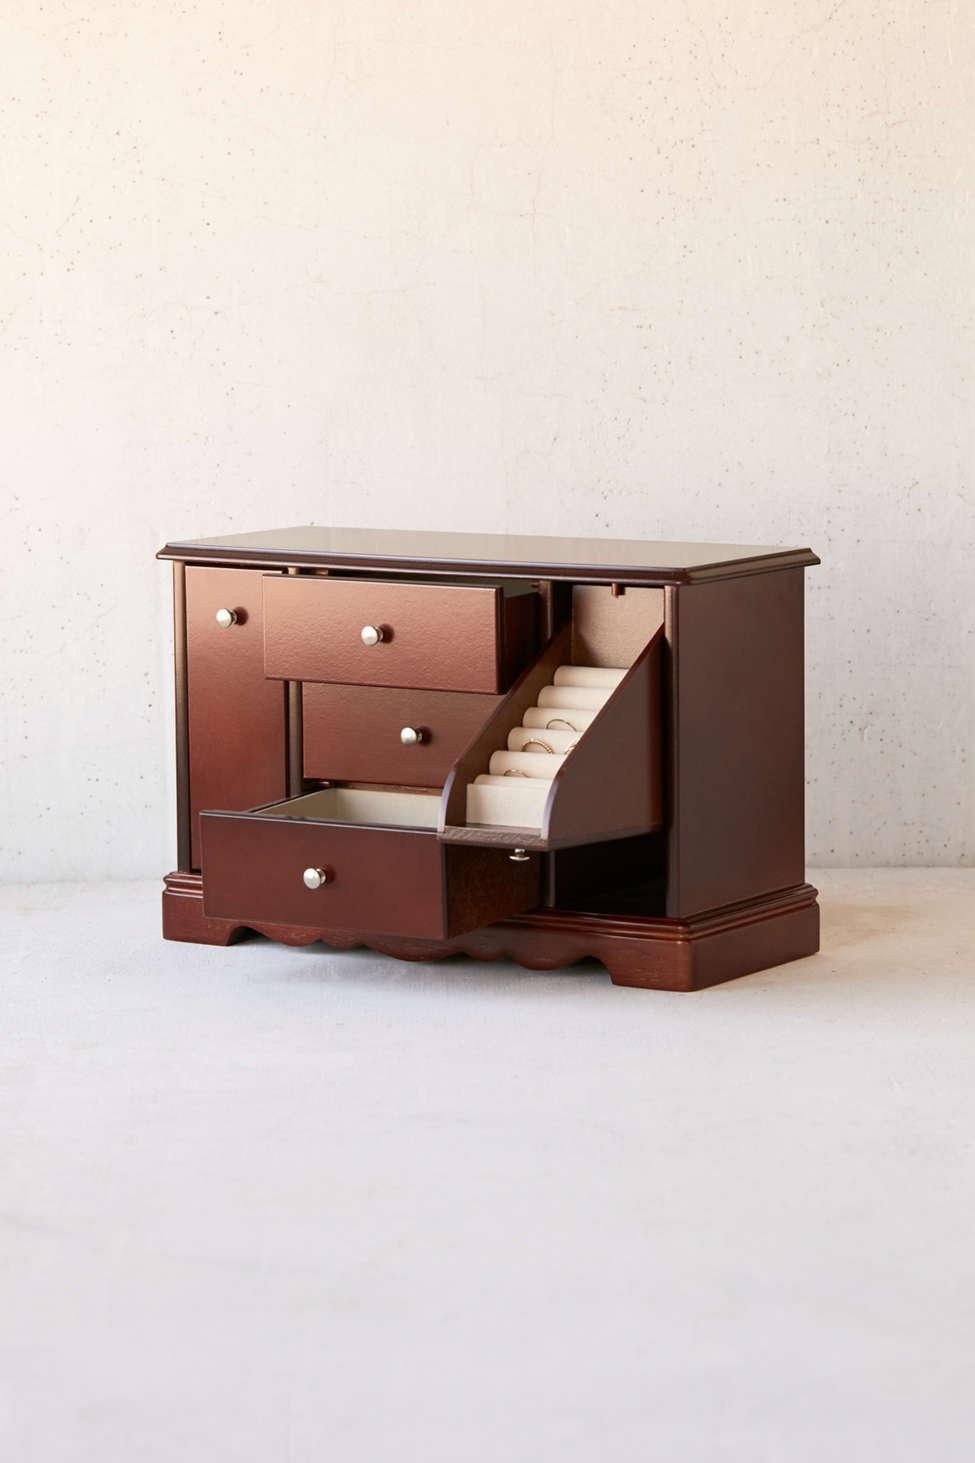 Slide View: 1: Mele & Co. Bancroft Jewelry Box